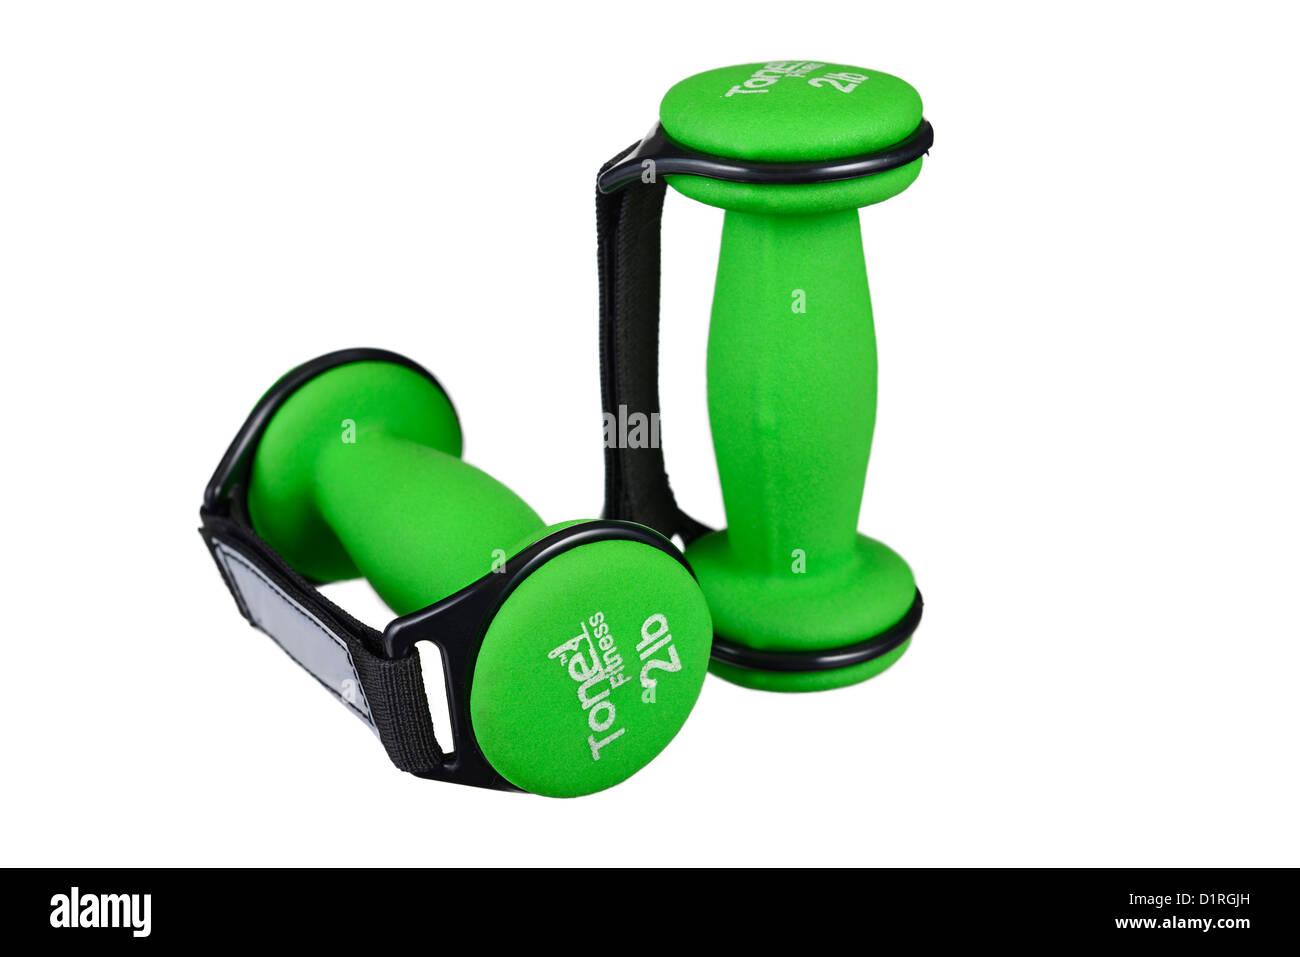 Manubri, tono, fitness fitness a piedi manubri con cinghie regolabili Immagini Stock